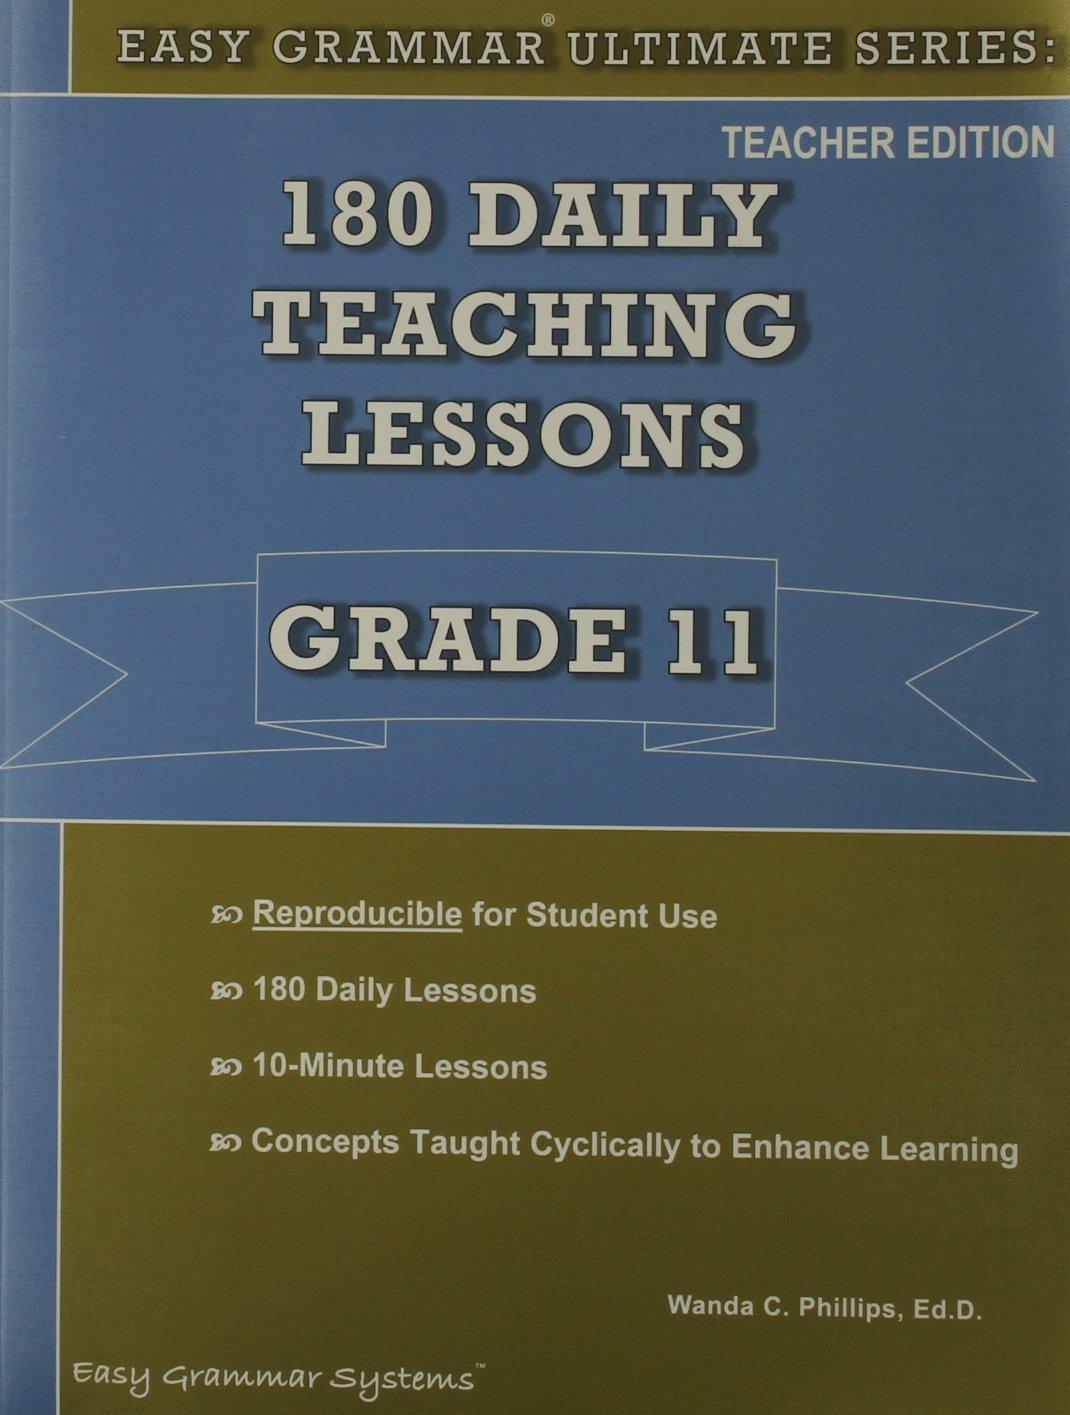 Easy Grammar Ultimate Series Teacher Book - Grade 11: Easy Grammer ...